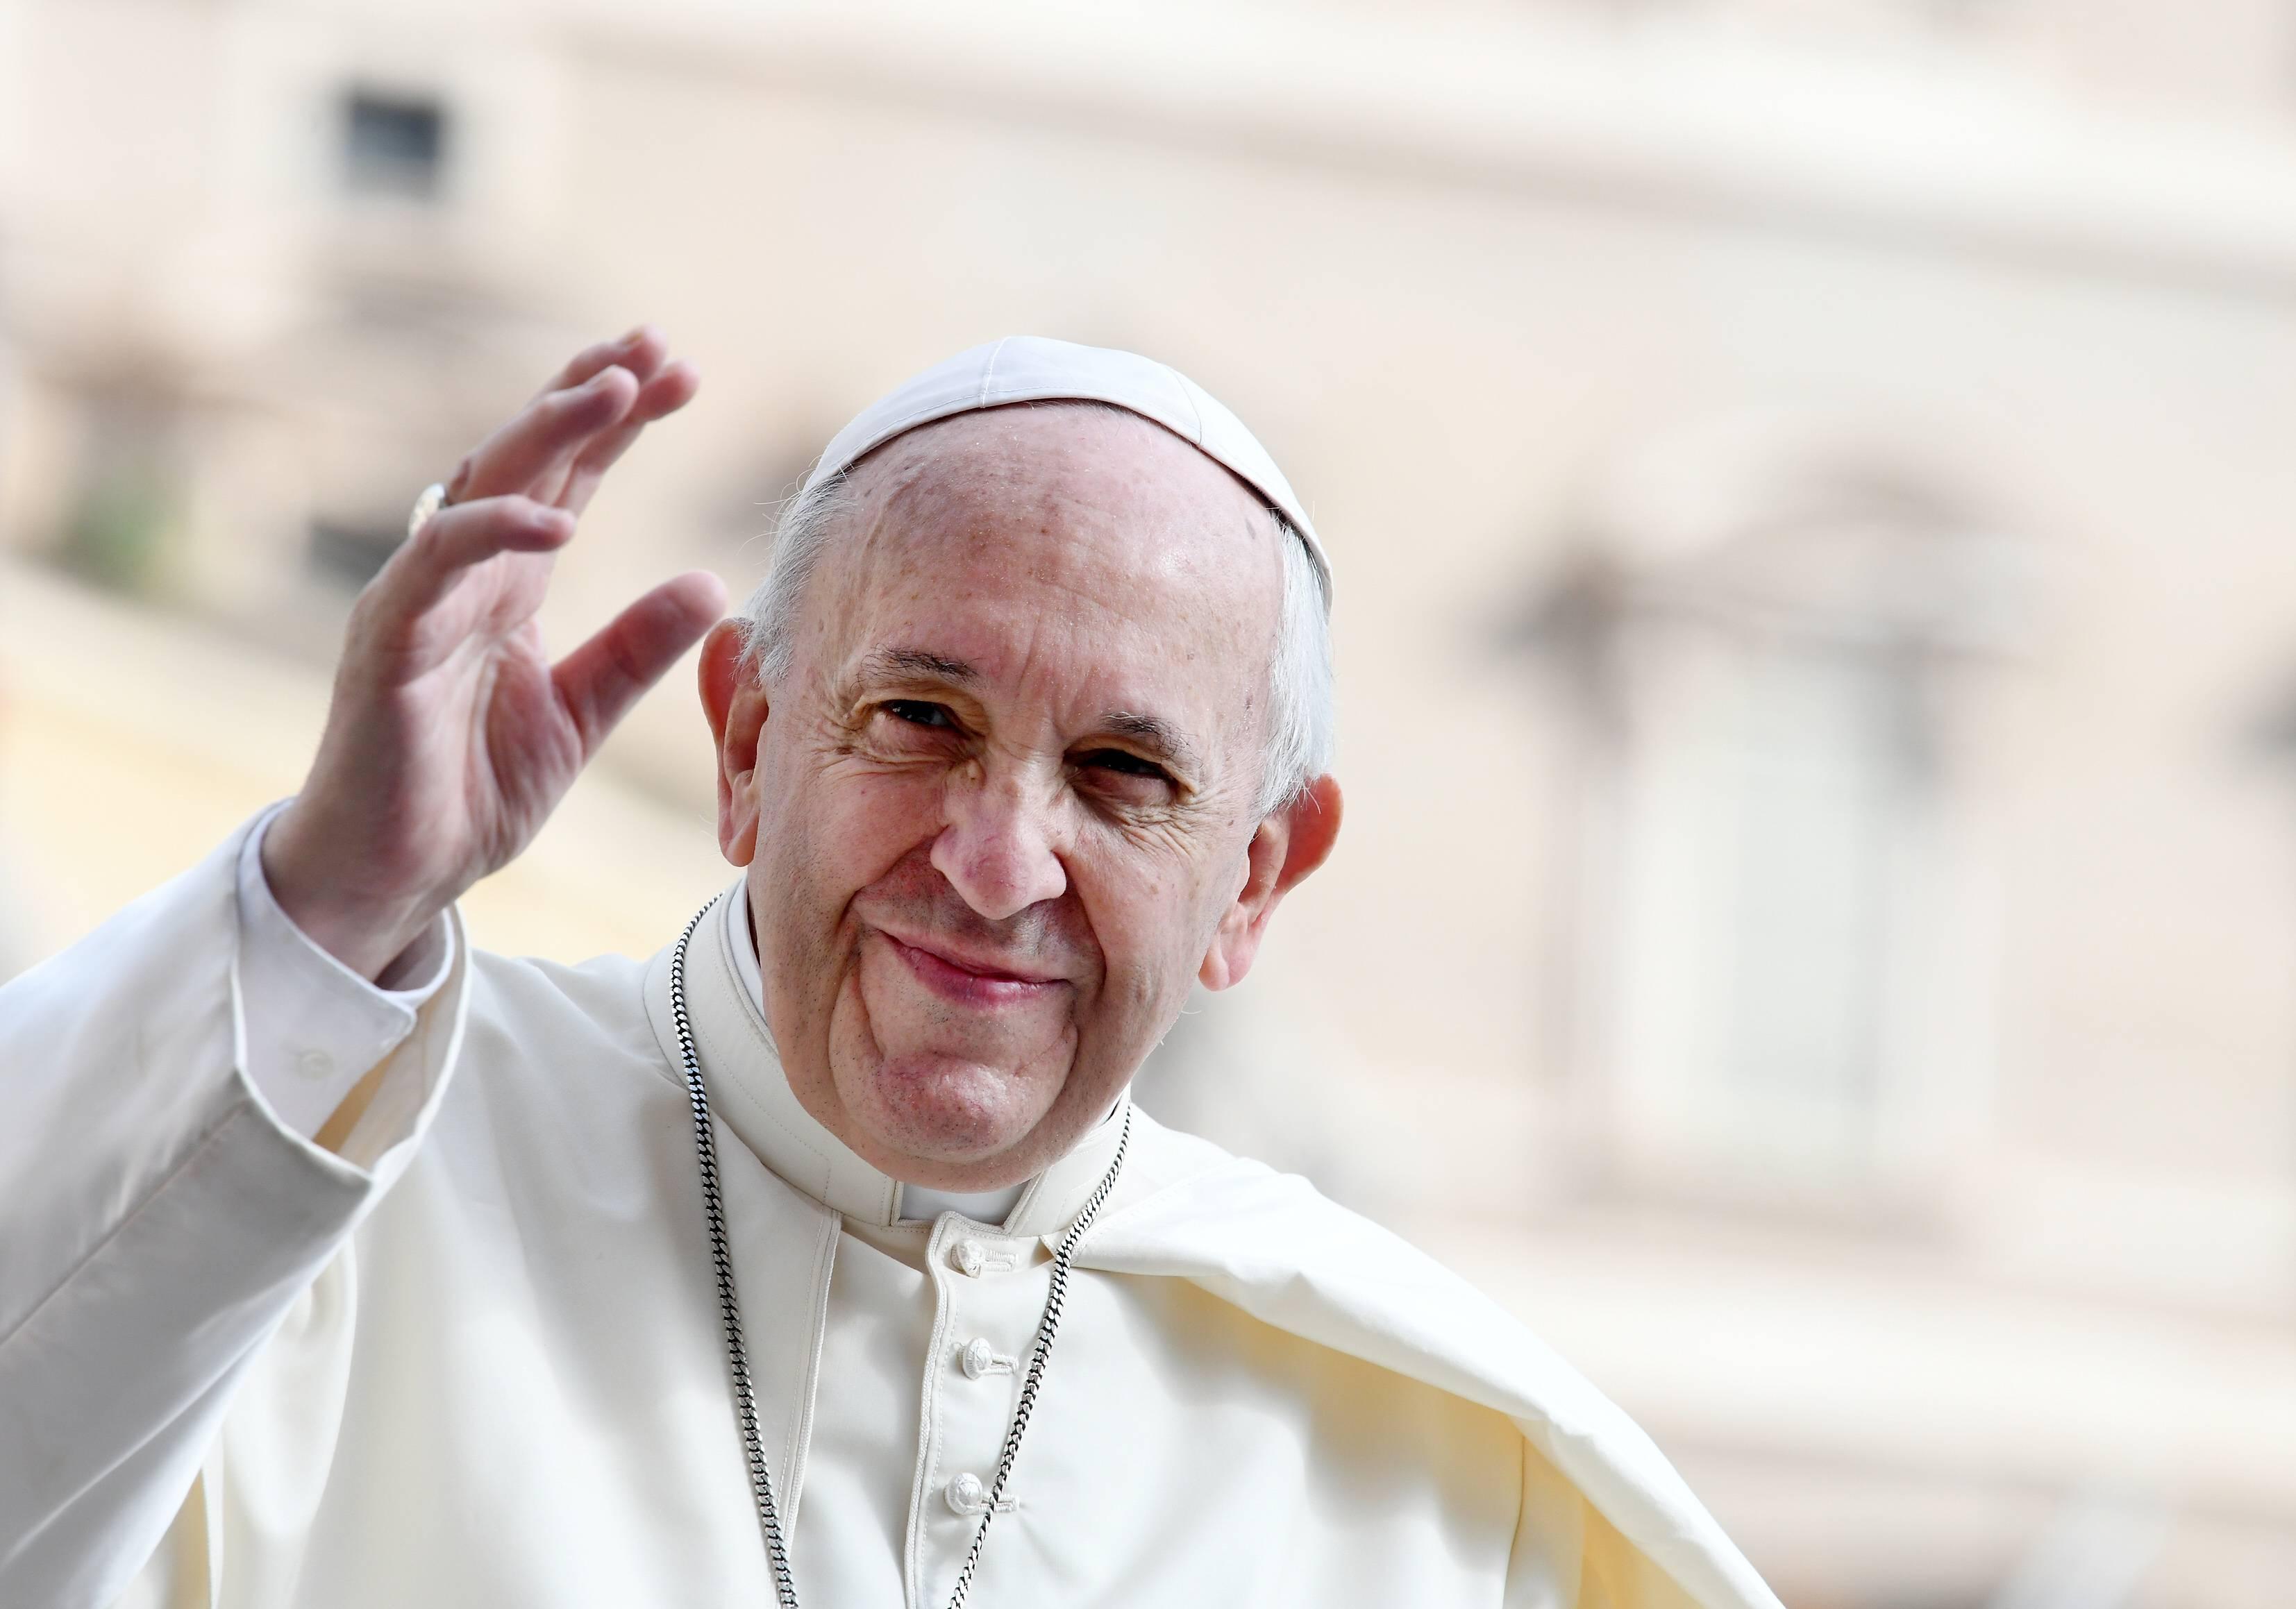 Franziskus Papst